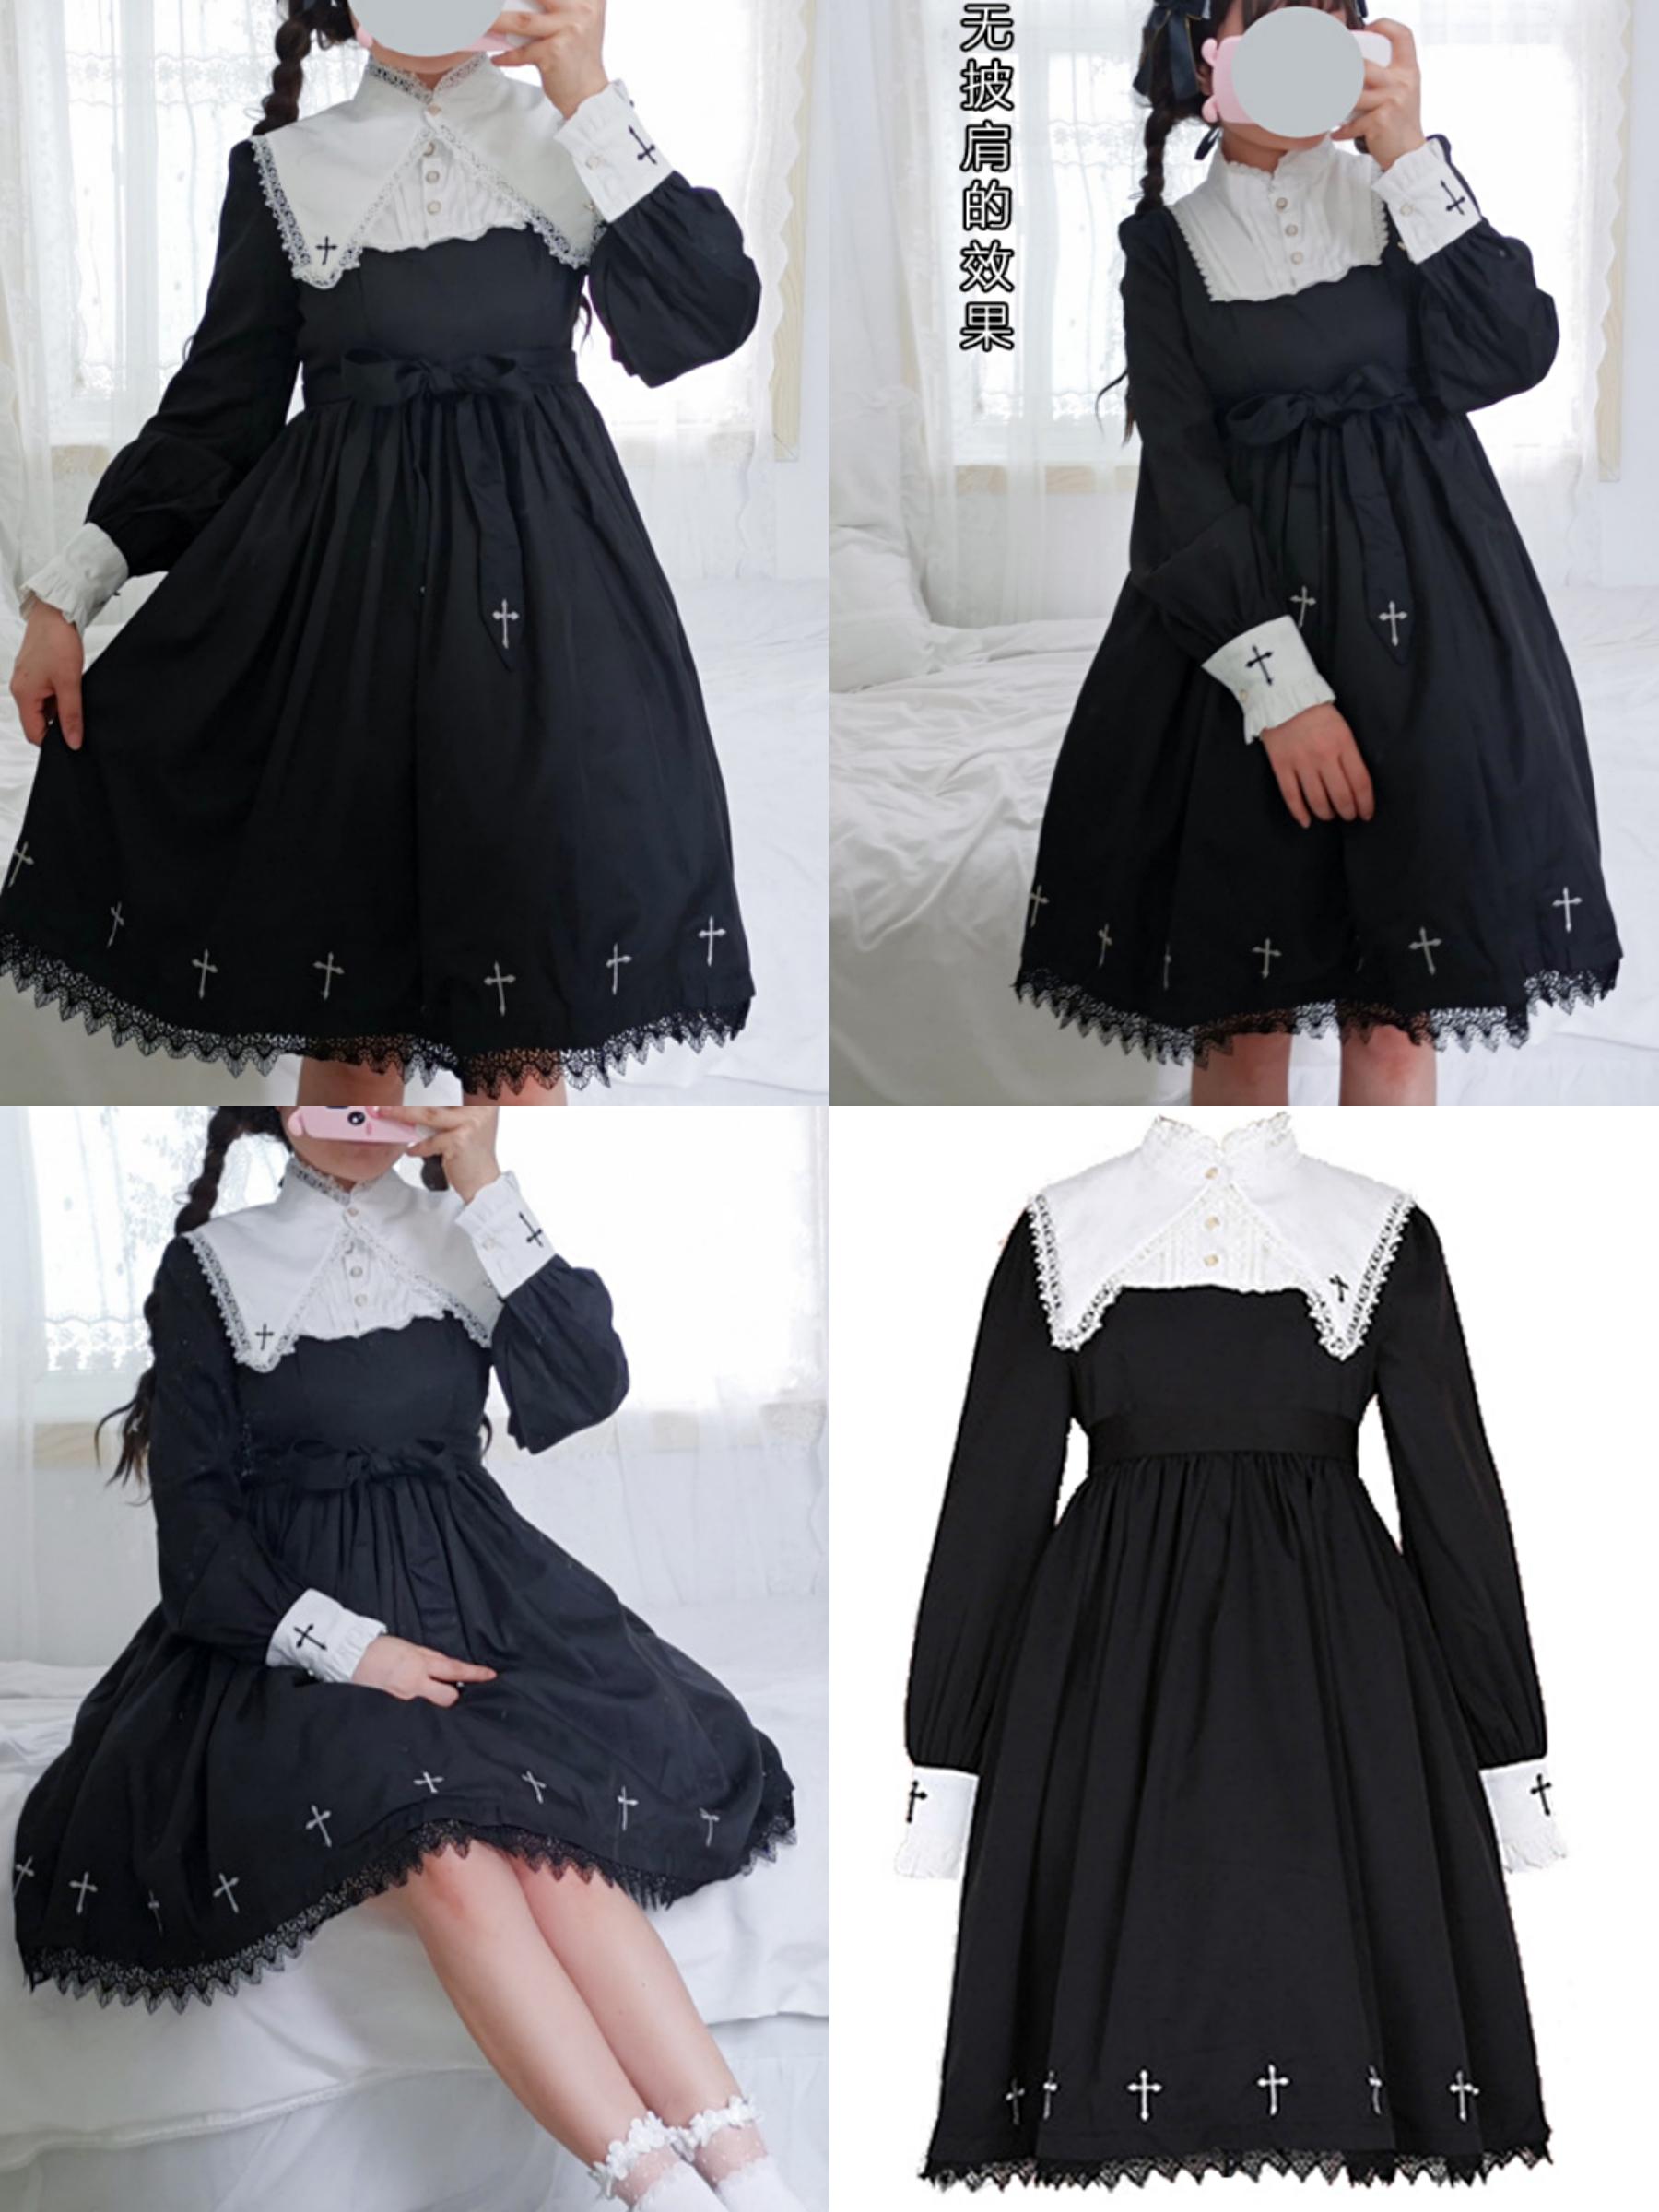 Lolita dark girl dress dark Department dress Lolita Dress Japanese soft girl black Lolita dark dress